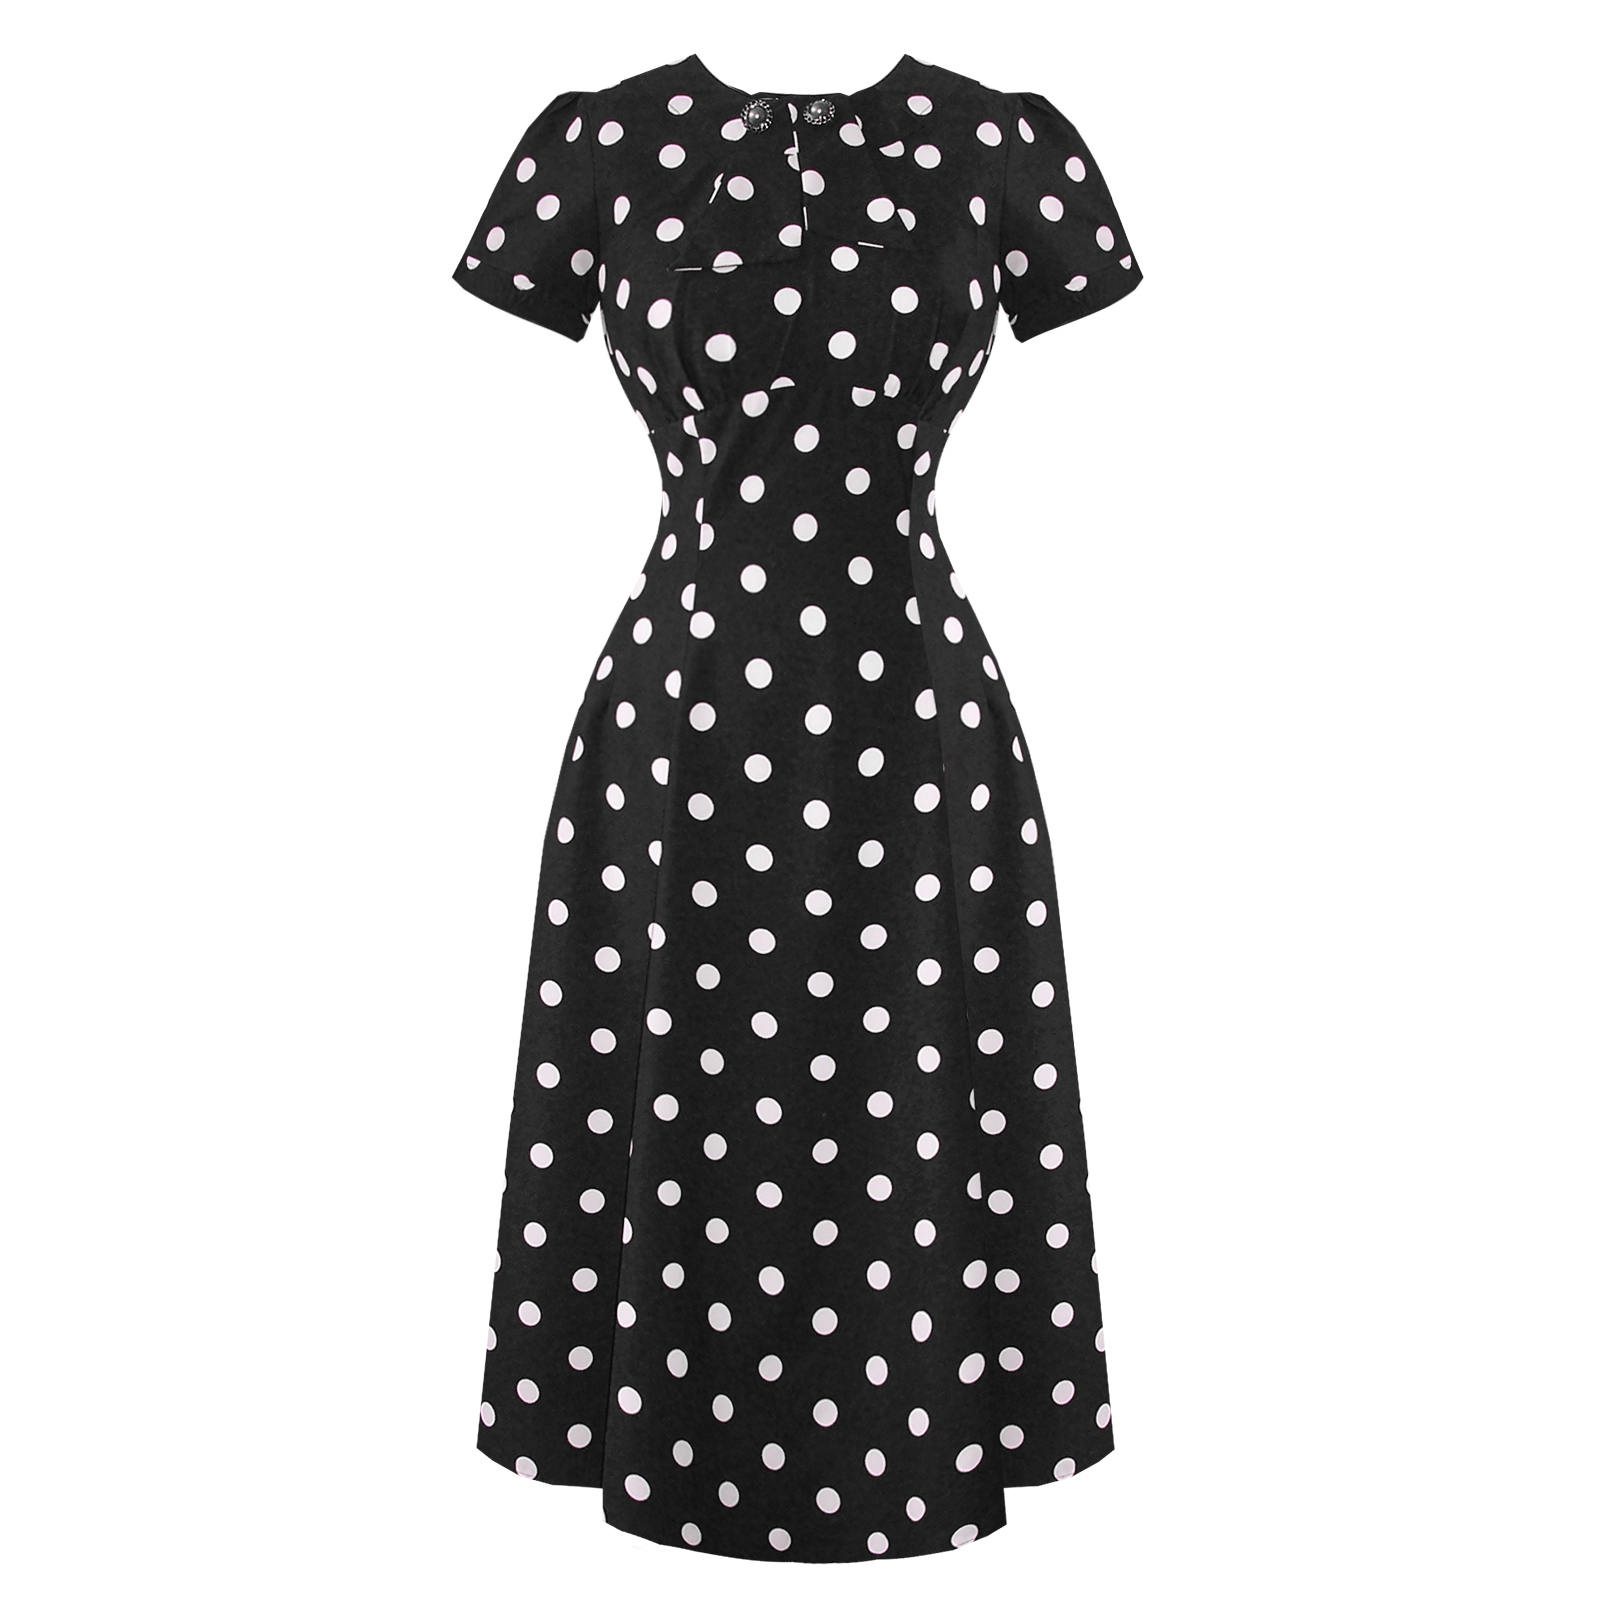 1940s style dress uk